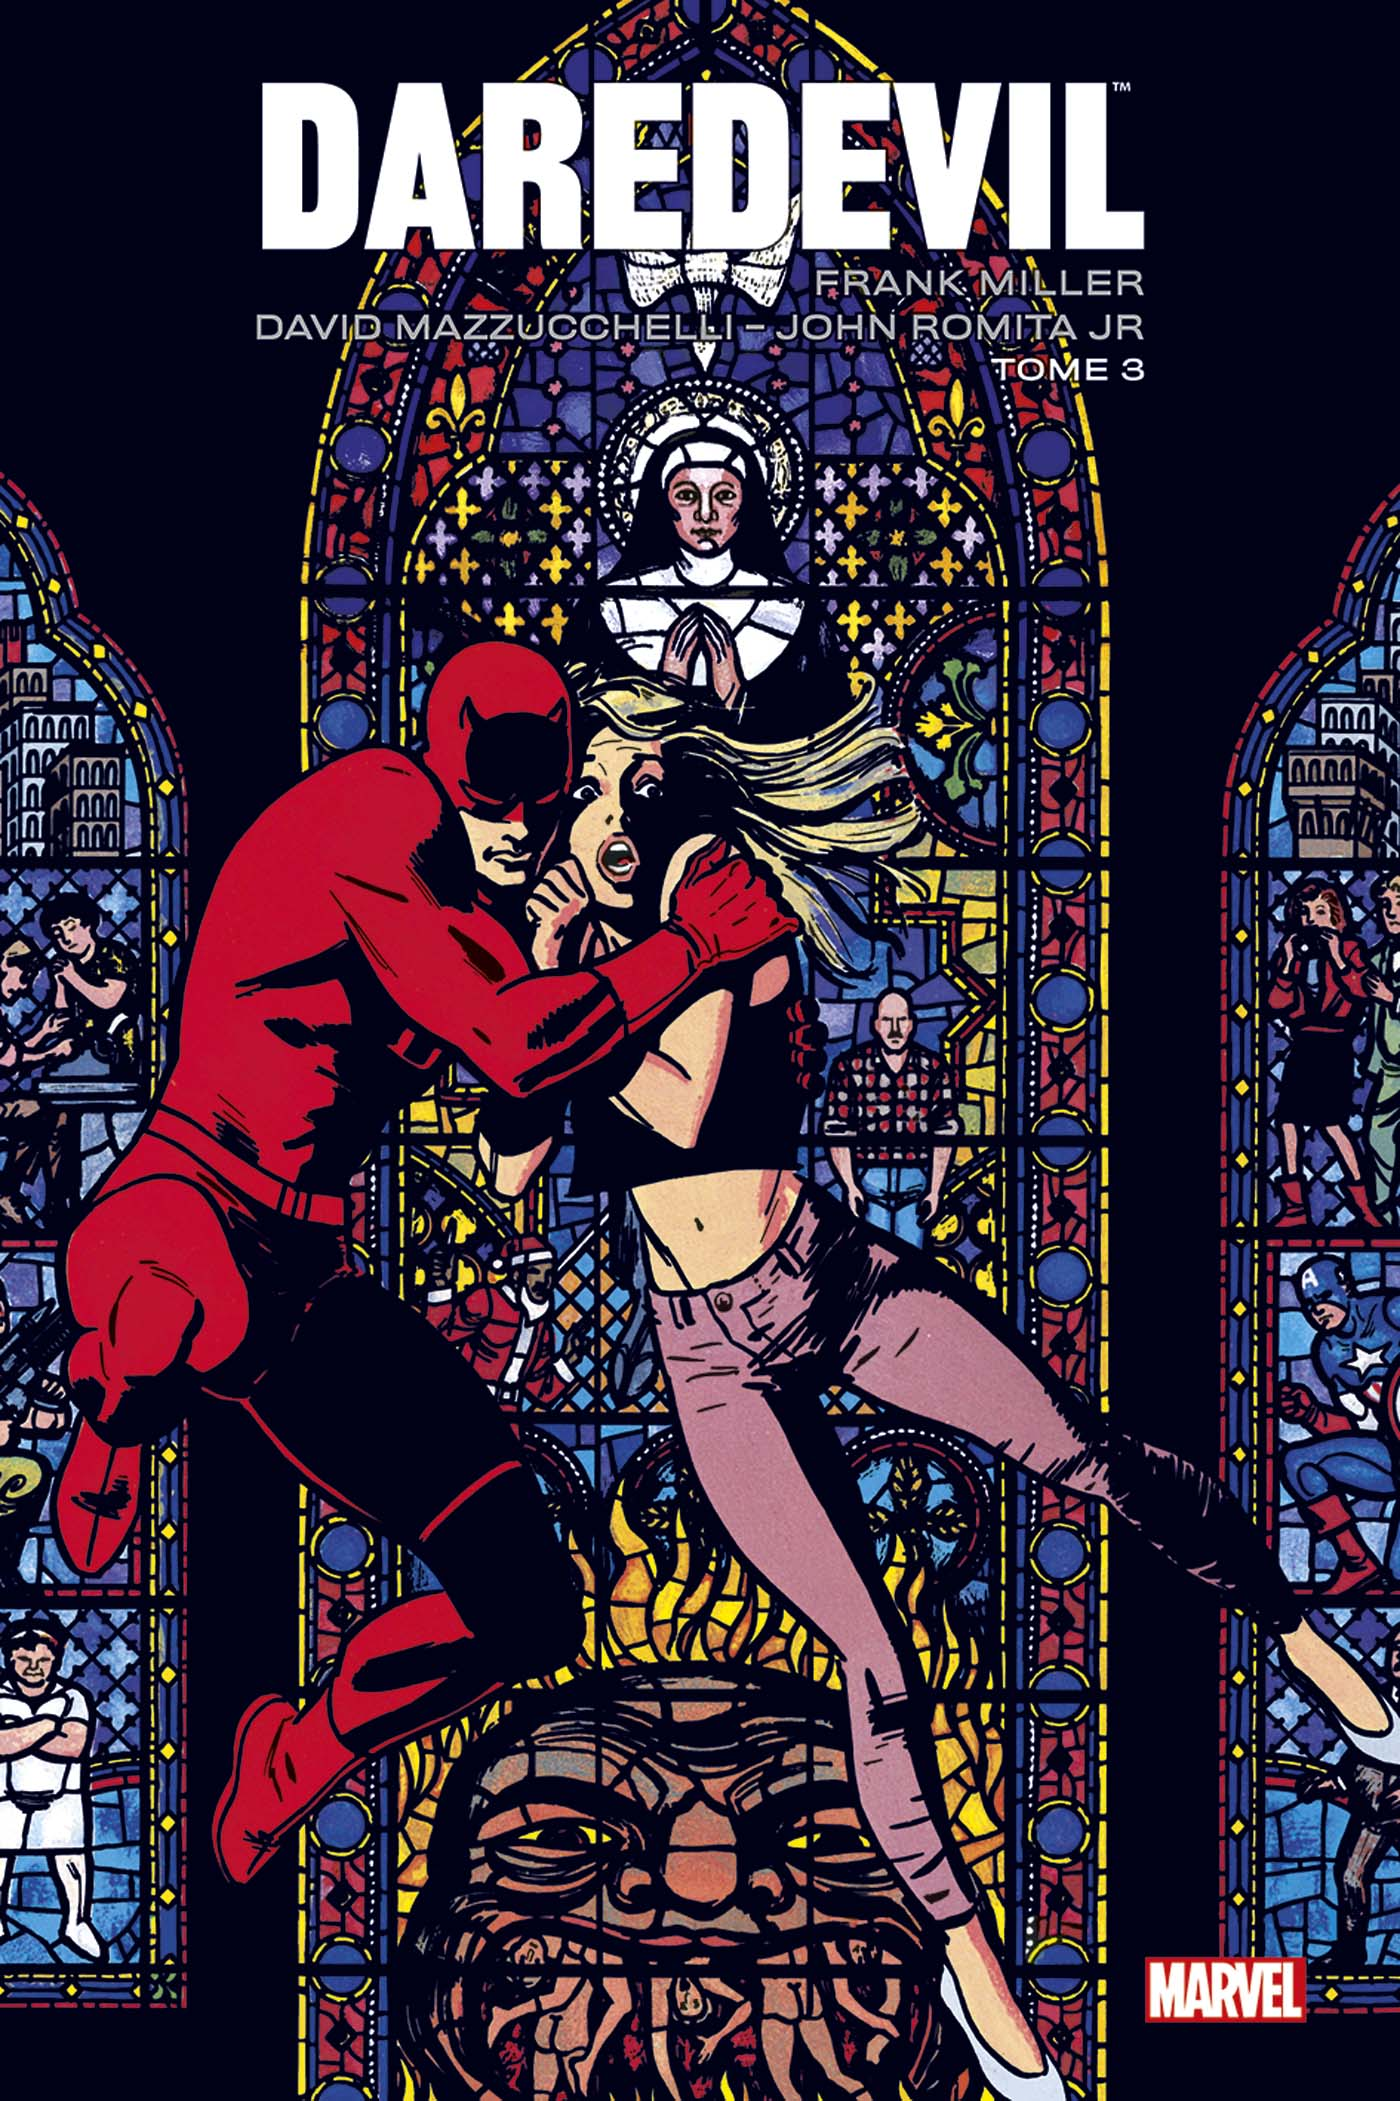 daredevil-par-frank-miller-comics-volume-3-tpb-hardcover-cartonnee-230408